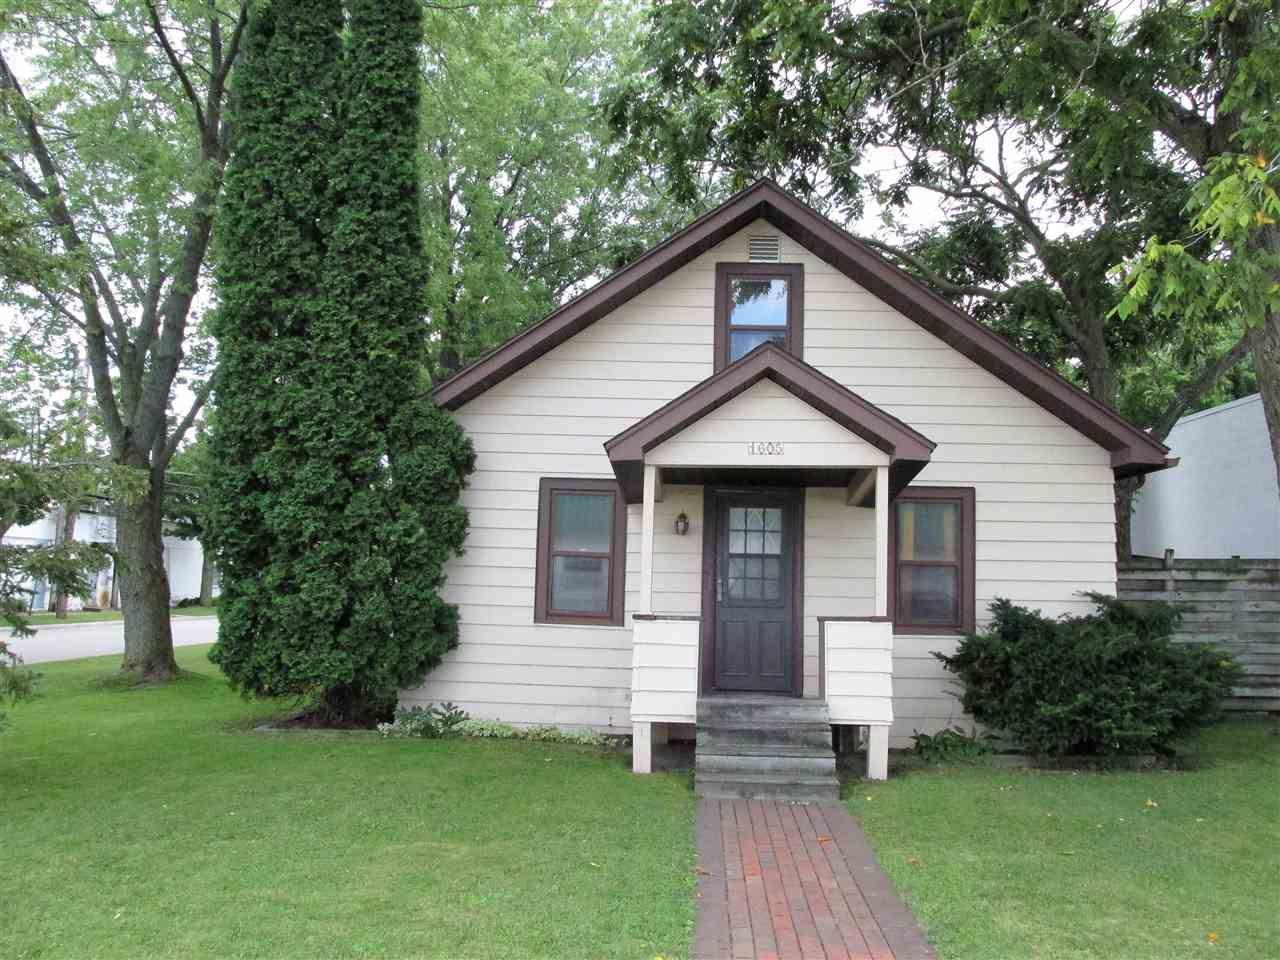 1605 W HASKEL Street, Appleton, WI 54914 - MLS#: 50245237